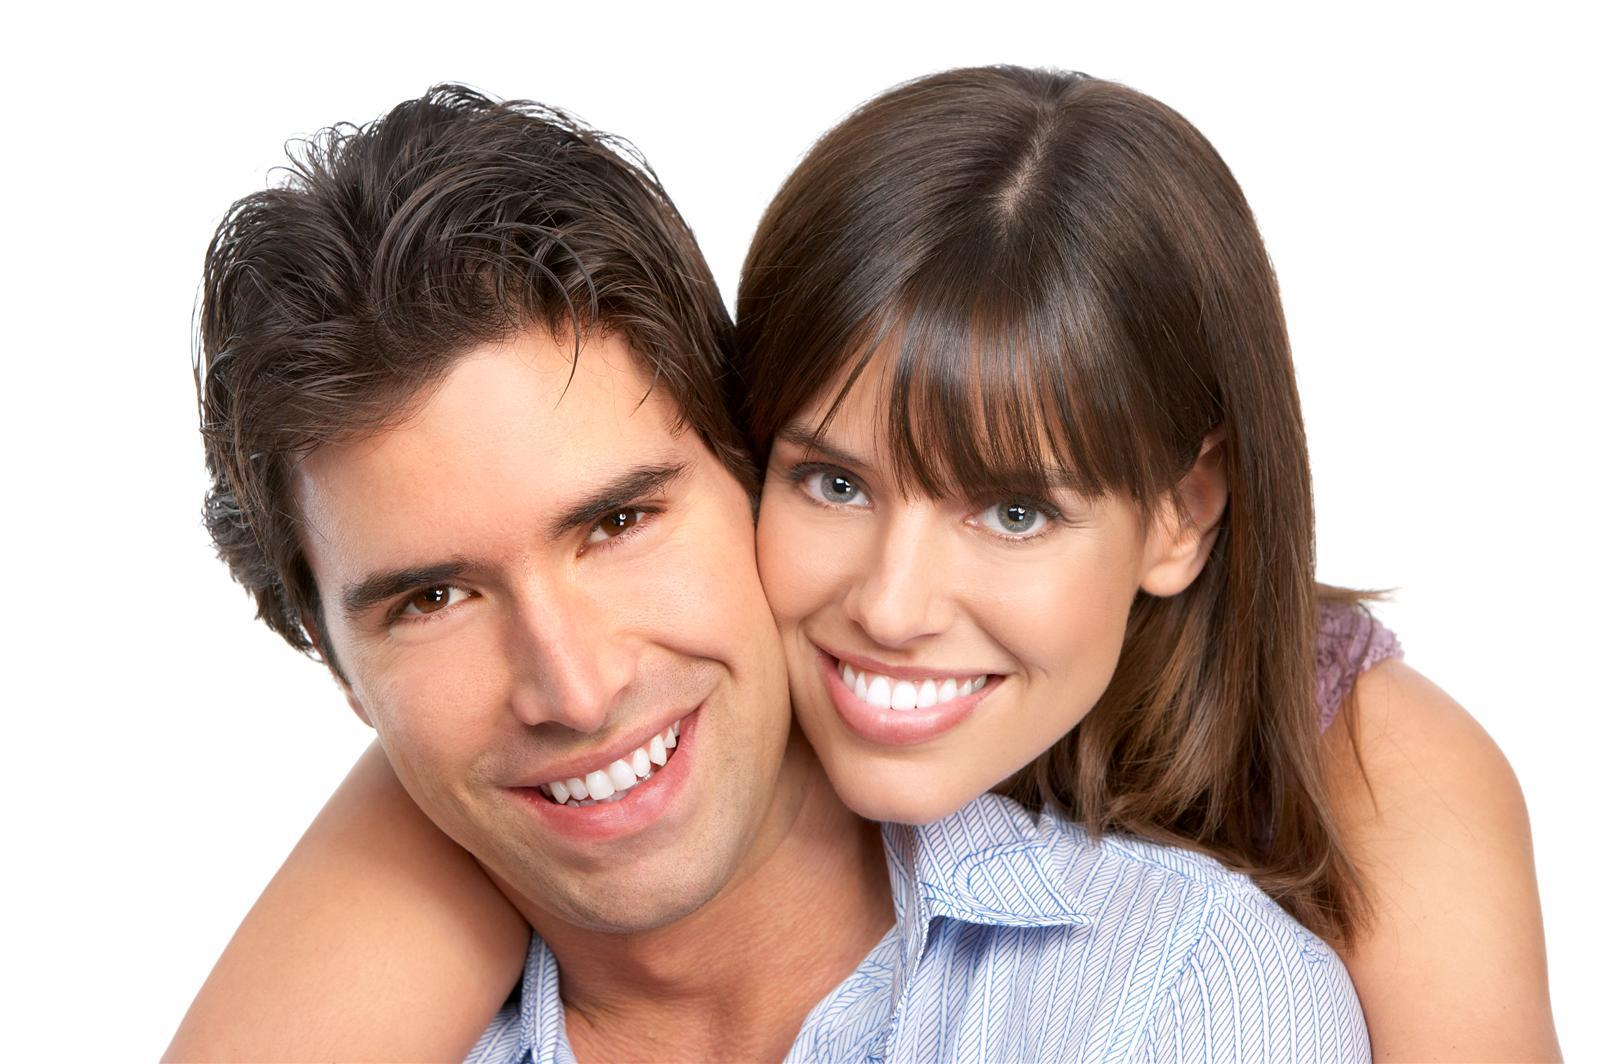 Gentle Care Family Dentistry: Marieve Rodriguez DMD - Dentist